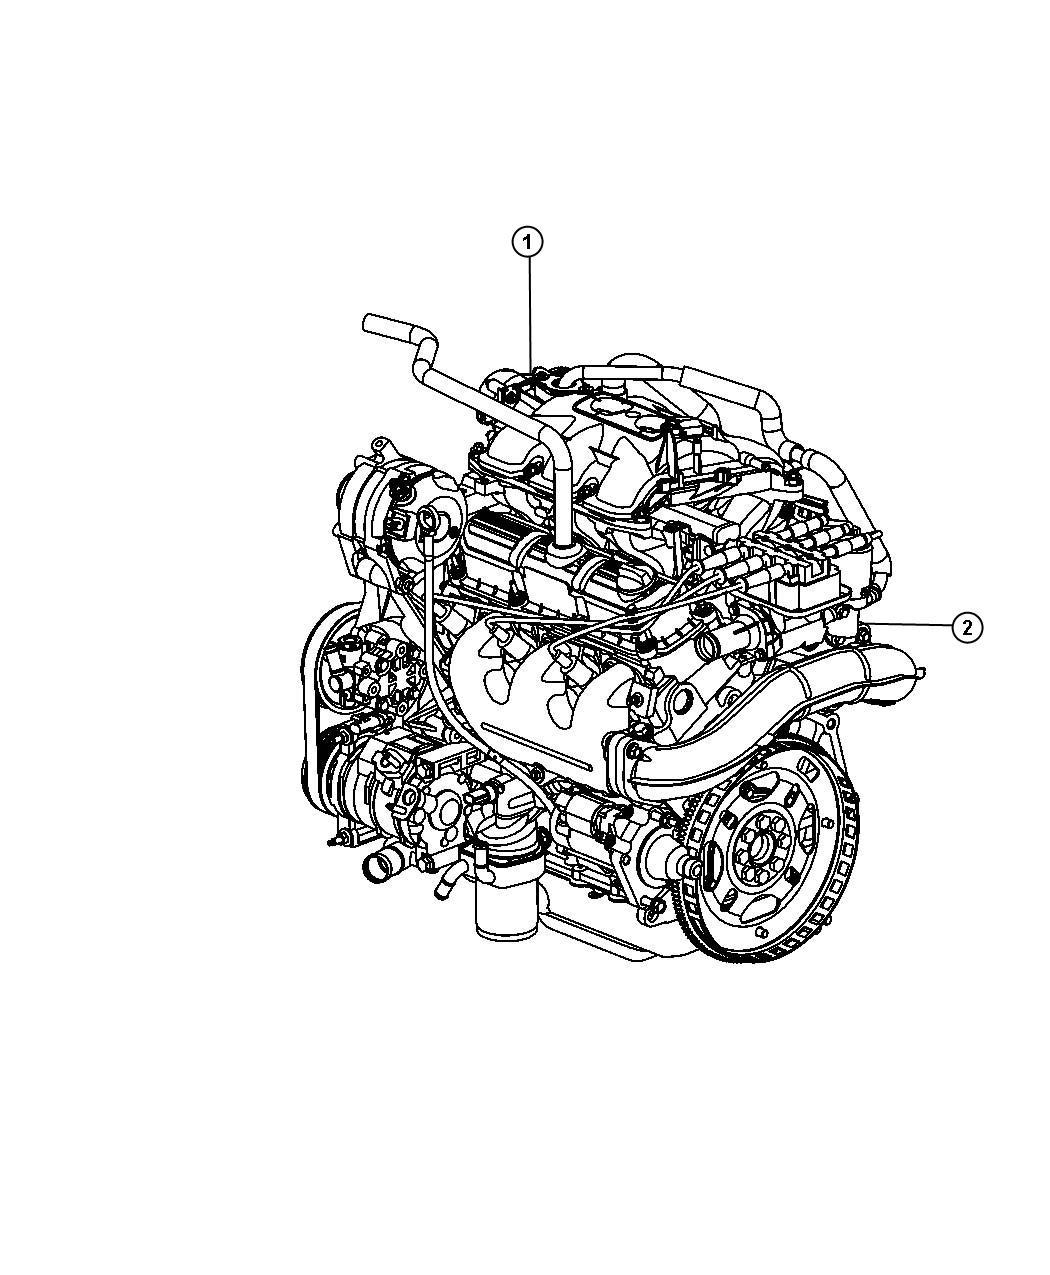 Jeep Wrangler Engine Long Block Remanufactured